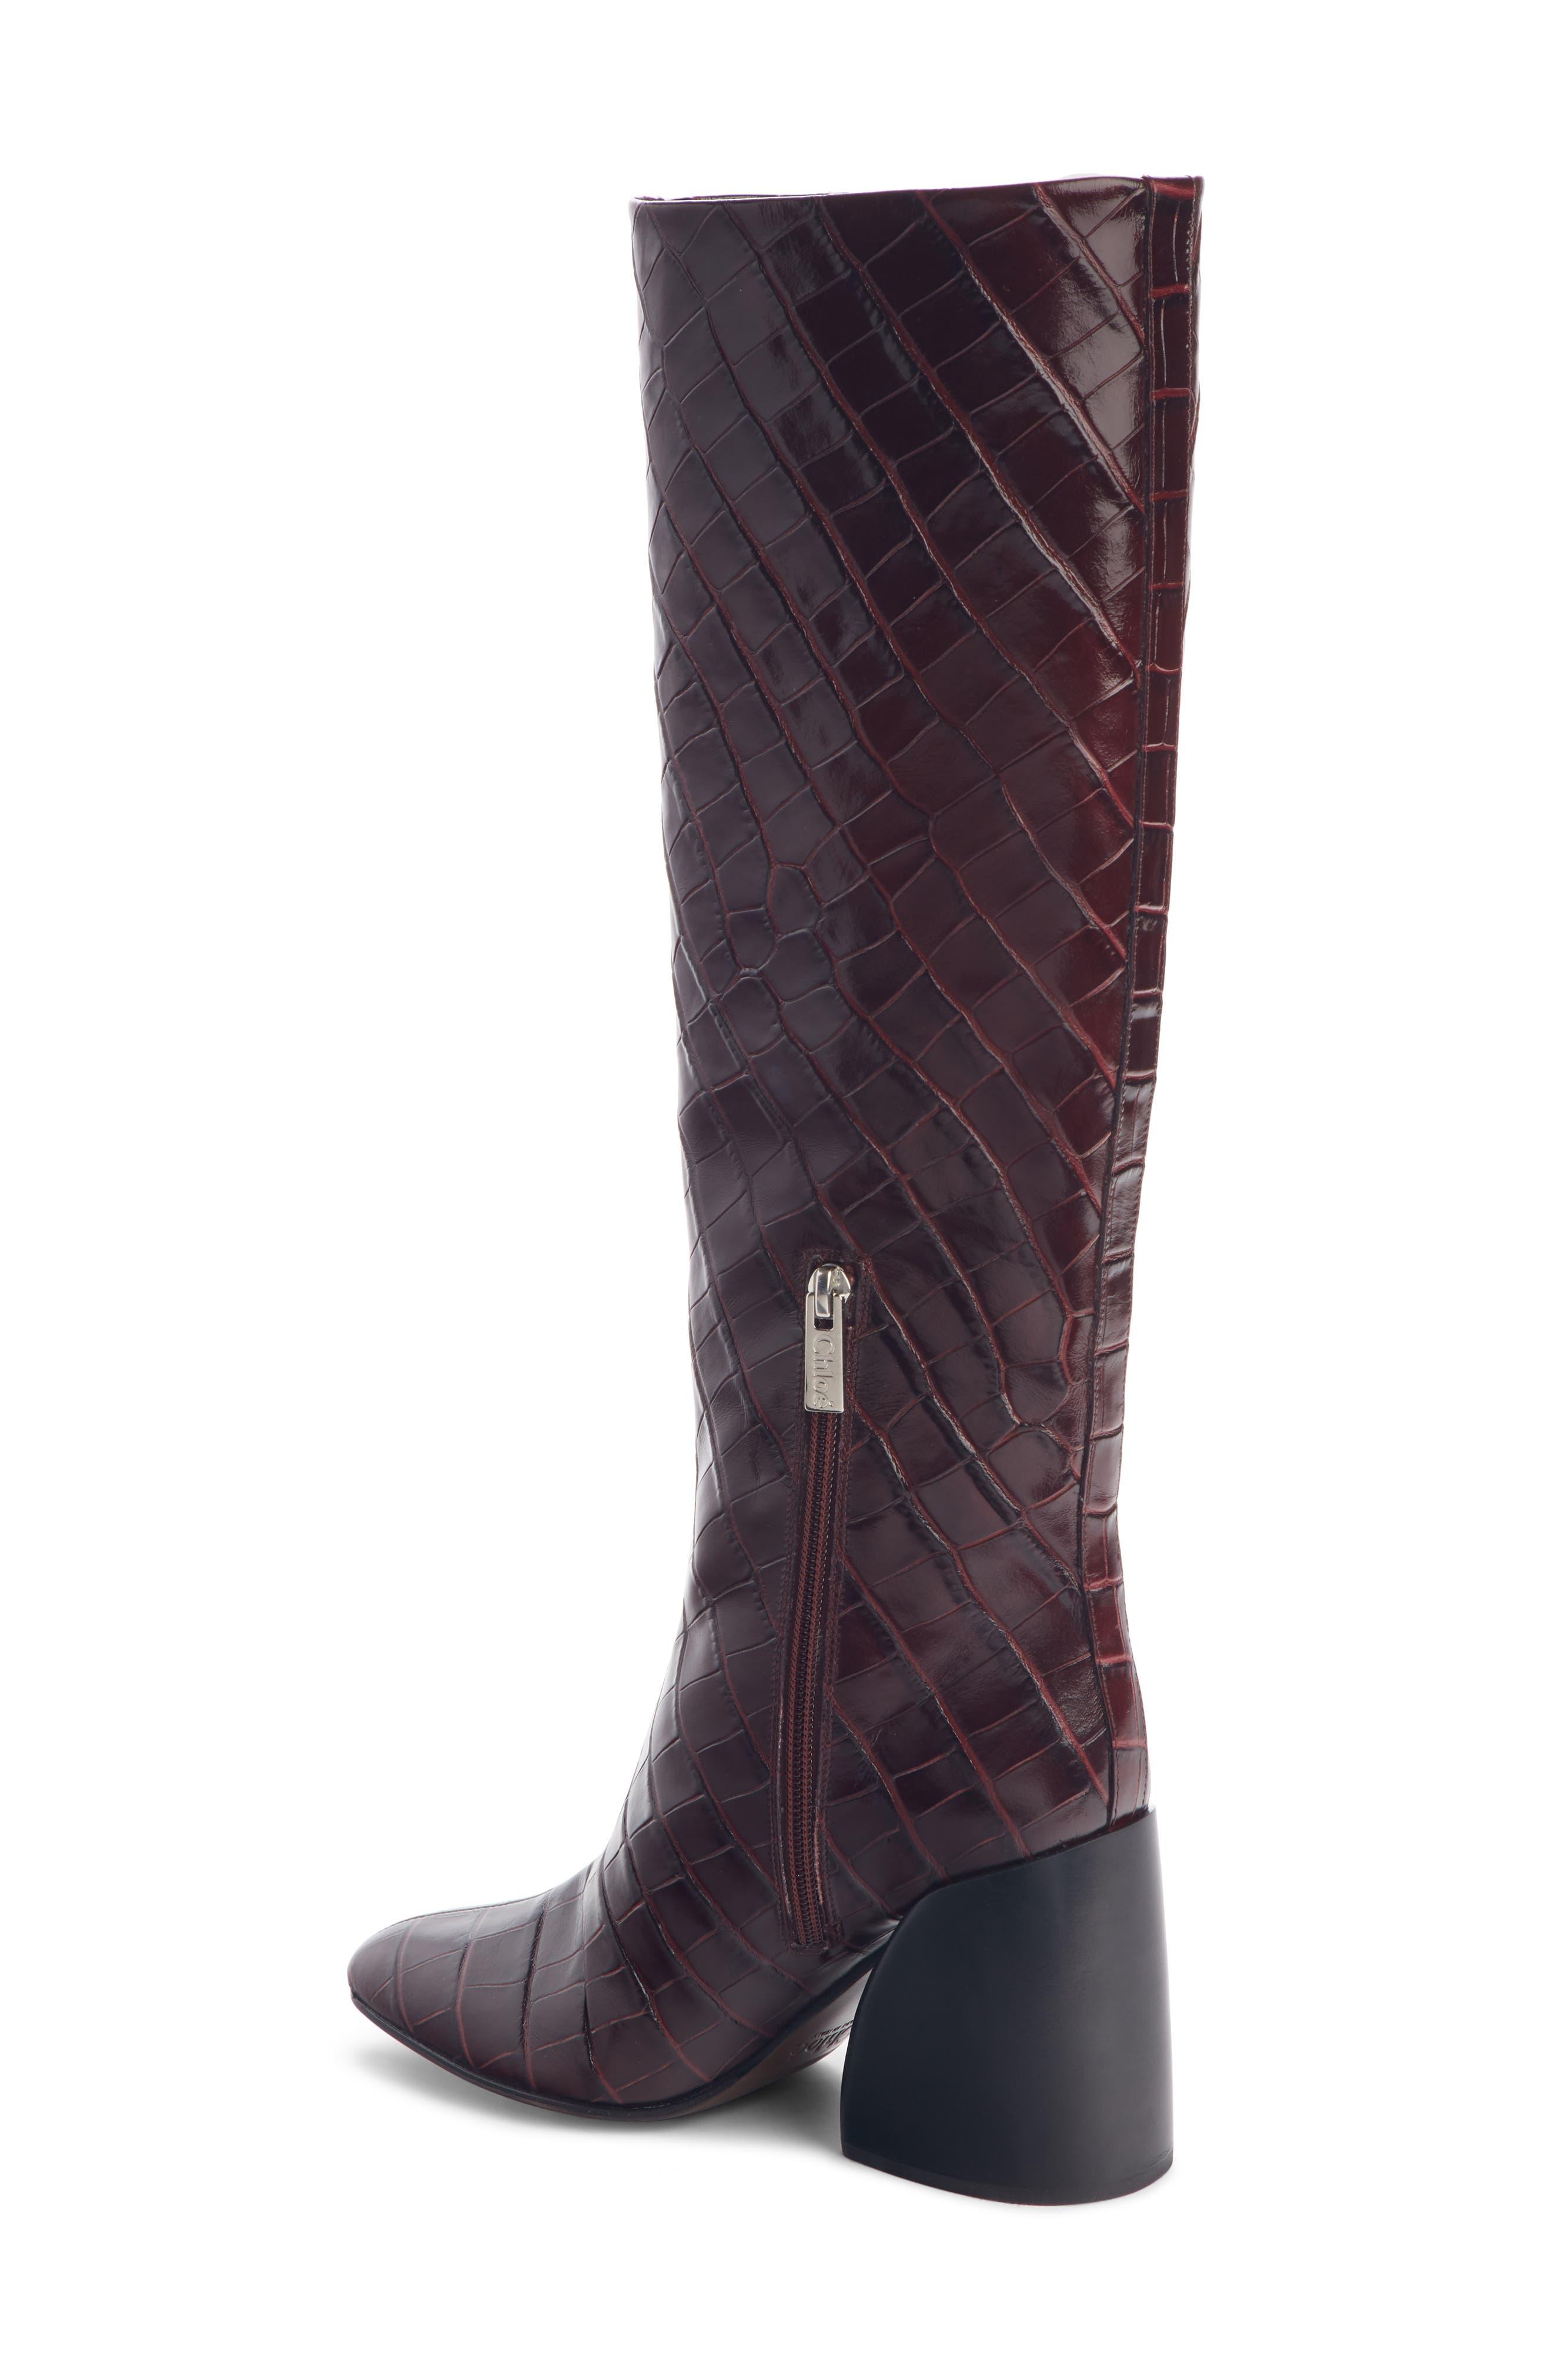 d5e6f258492 Women's Chloé Boots | Nordstrom